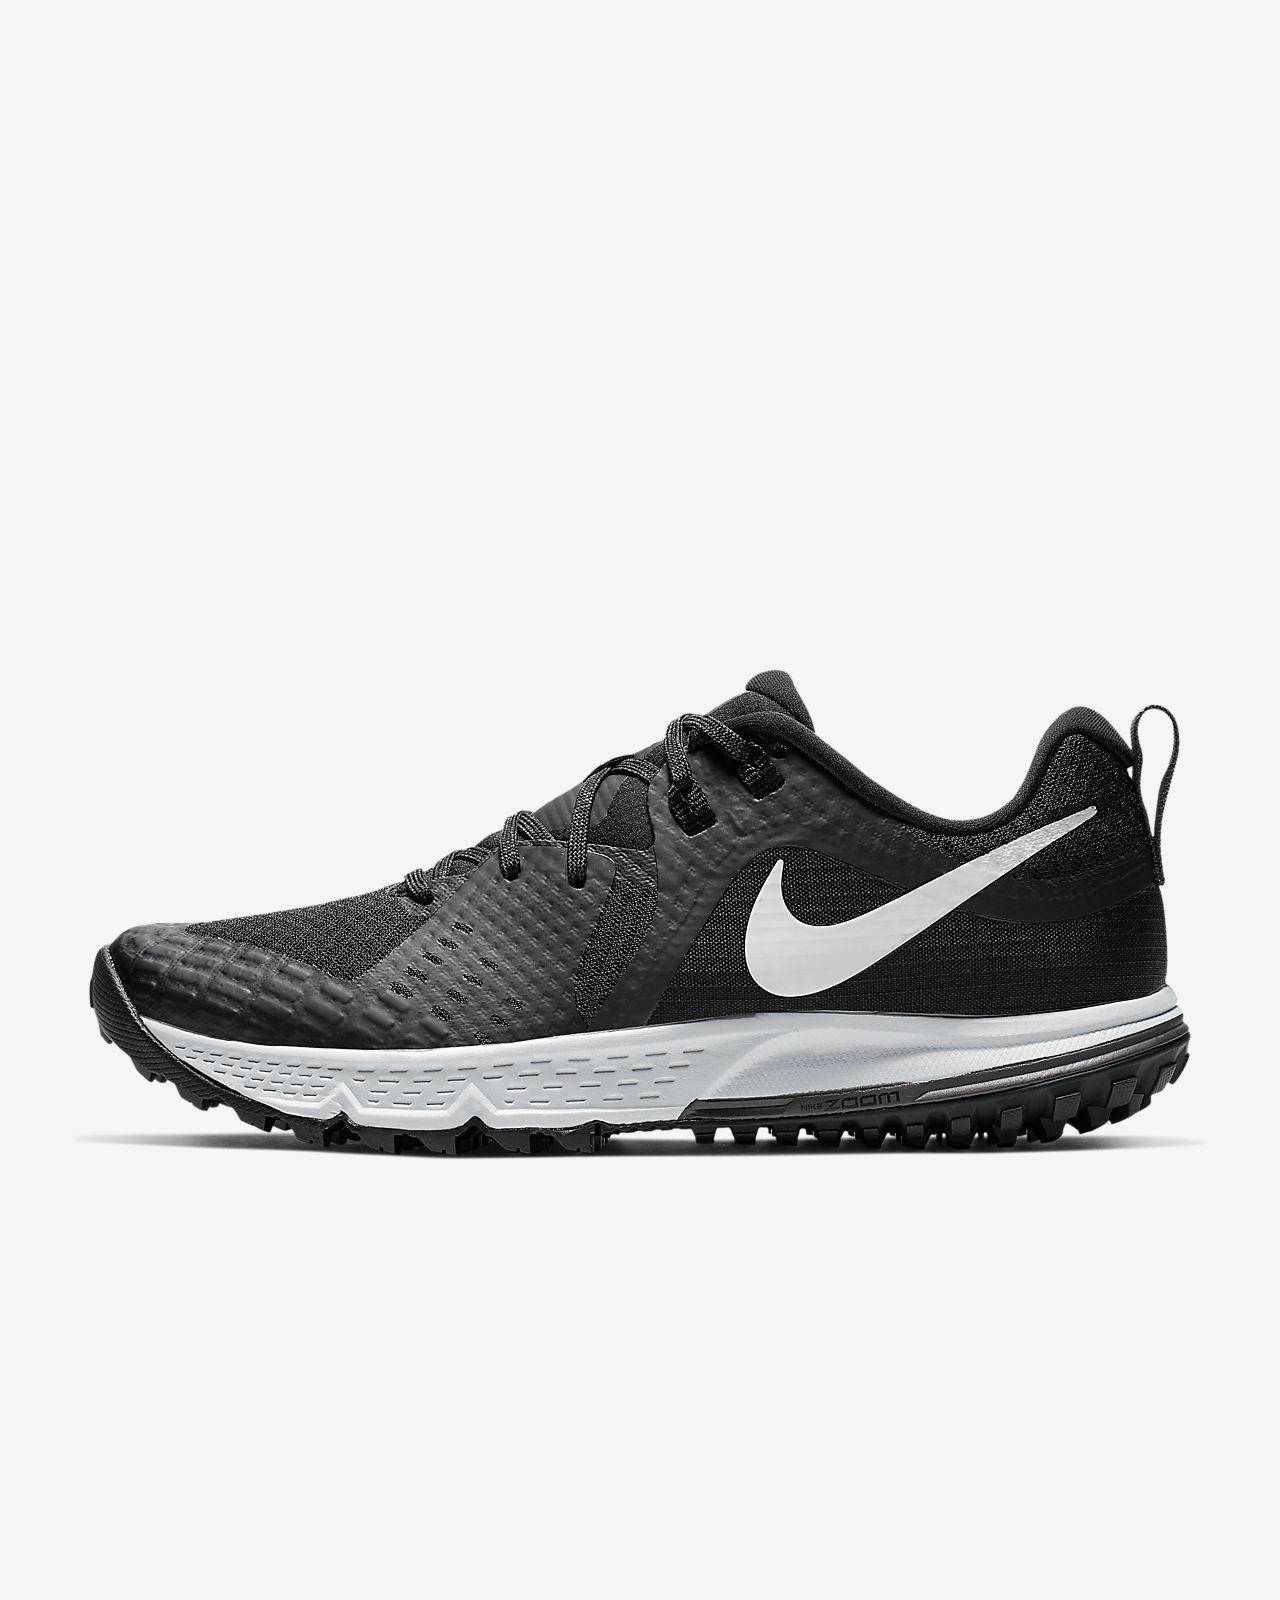 Calzado de running para mujer Nike Air Zoom Wildhorse 5